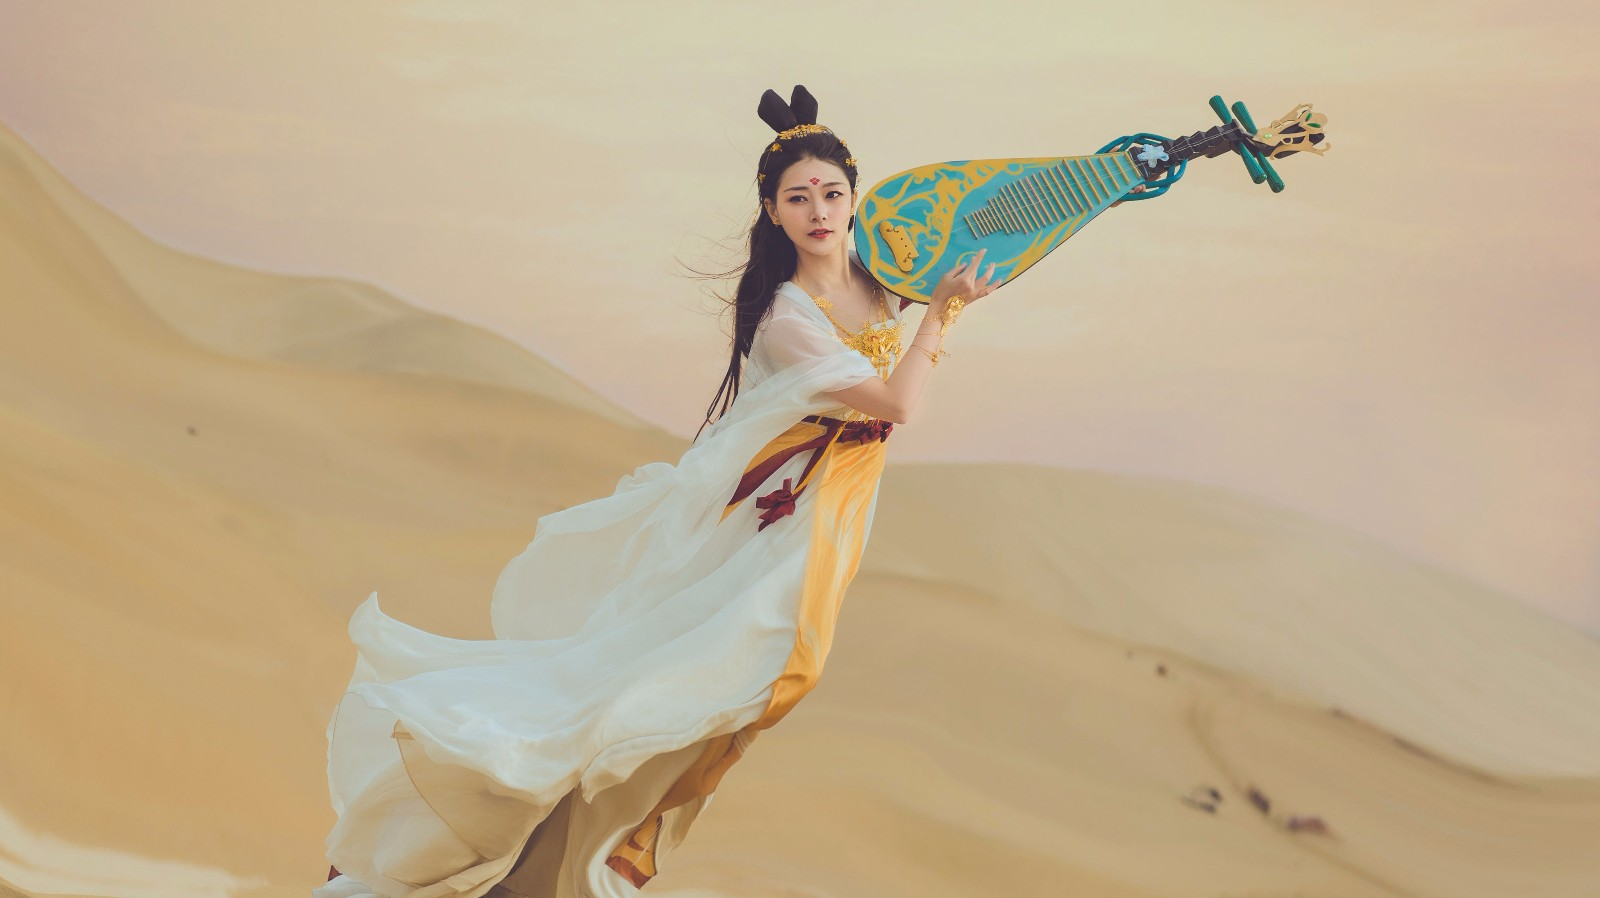 2018 ChinaJoy Cosplay封面大赛落幕 天刀特别奖获奖名单公布!